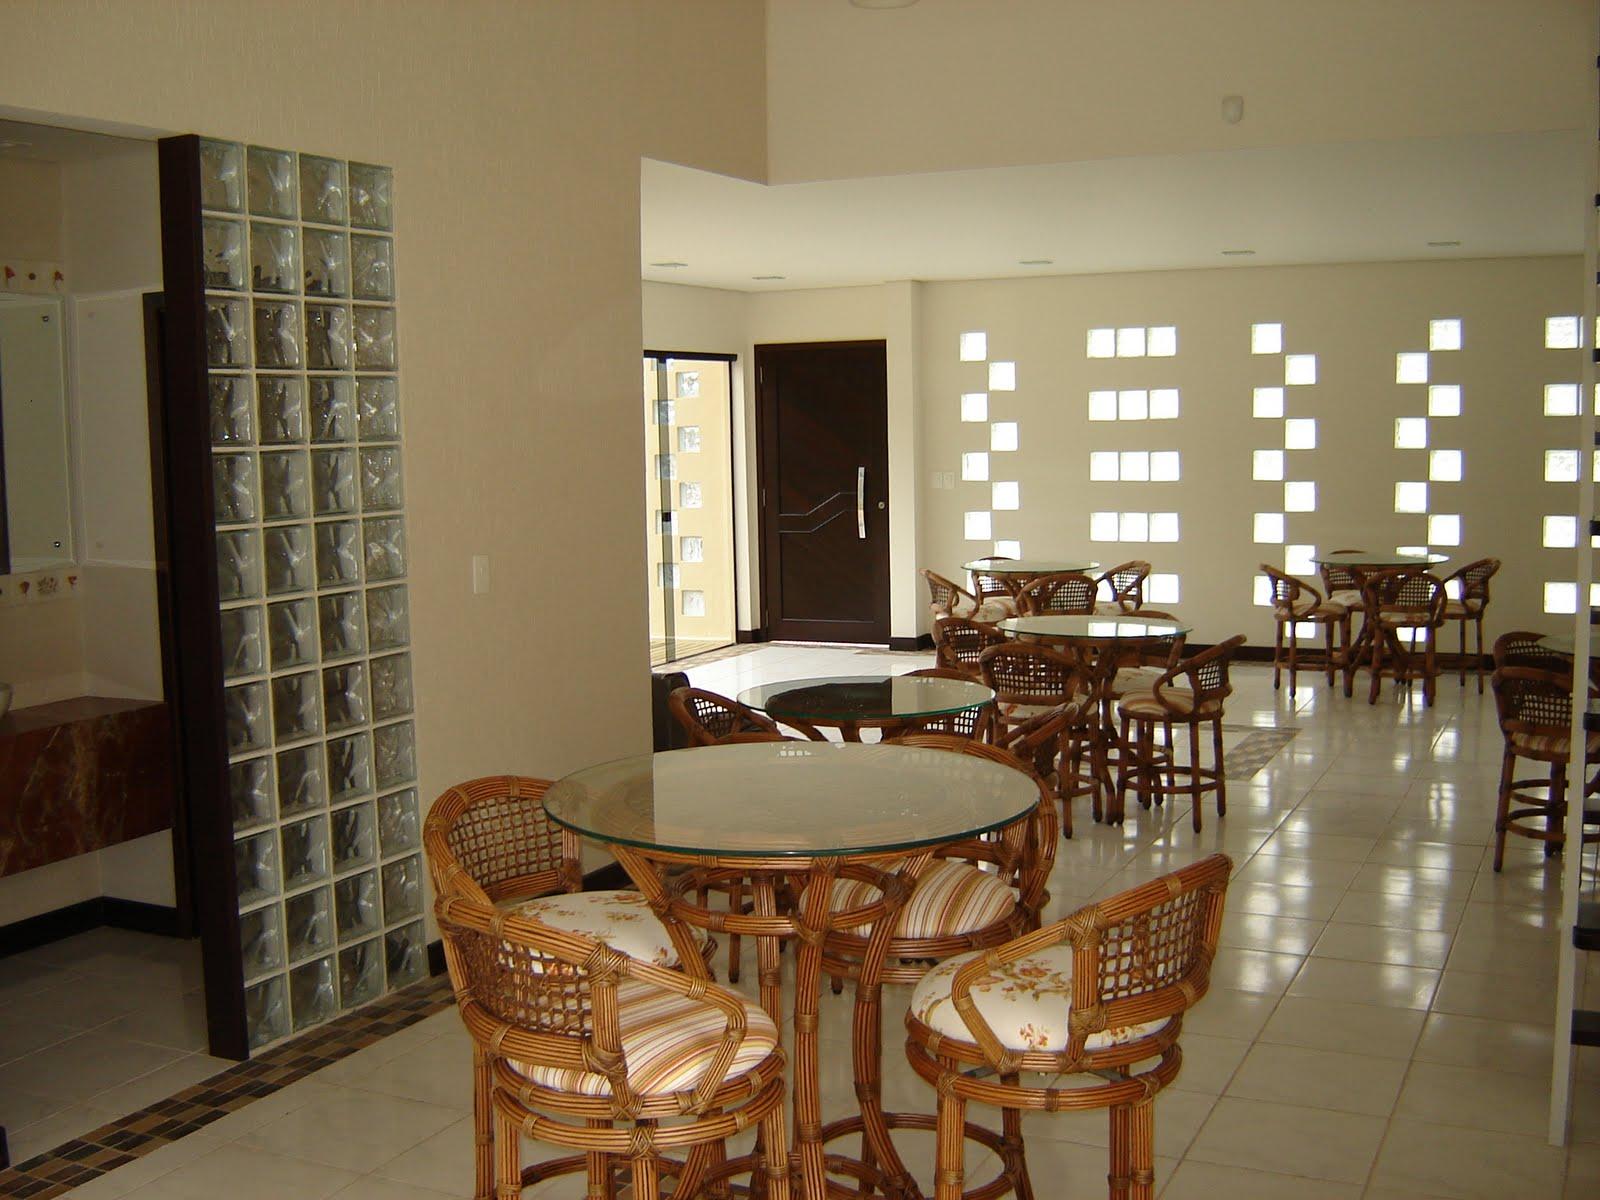 decoracao de interiores joinville : decoracao de interiores joinville:Sobrado arquitetura: Reformas interiores de casas